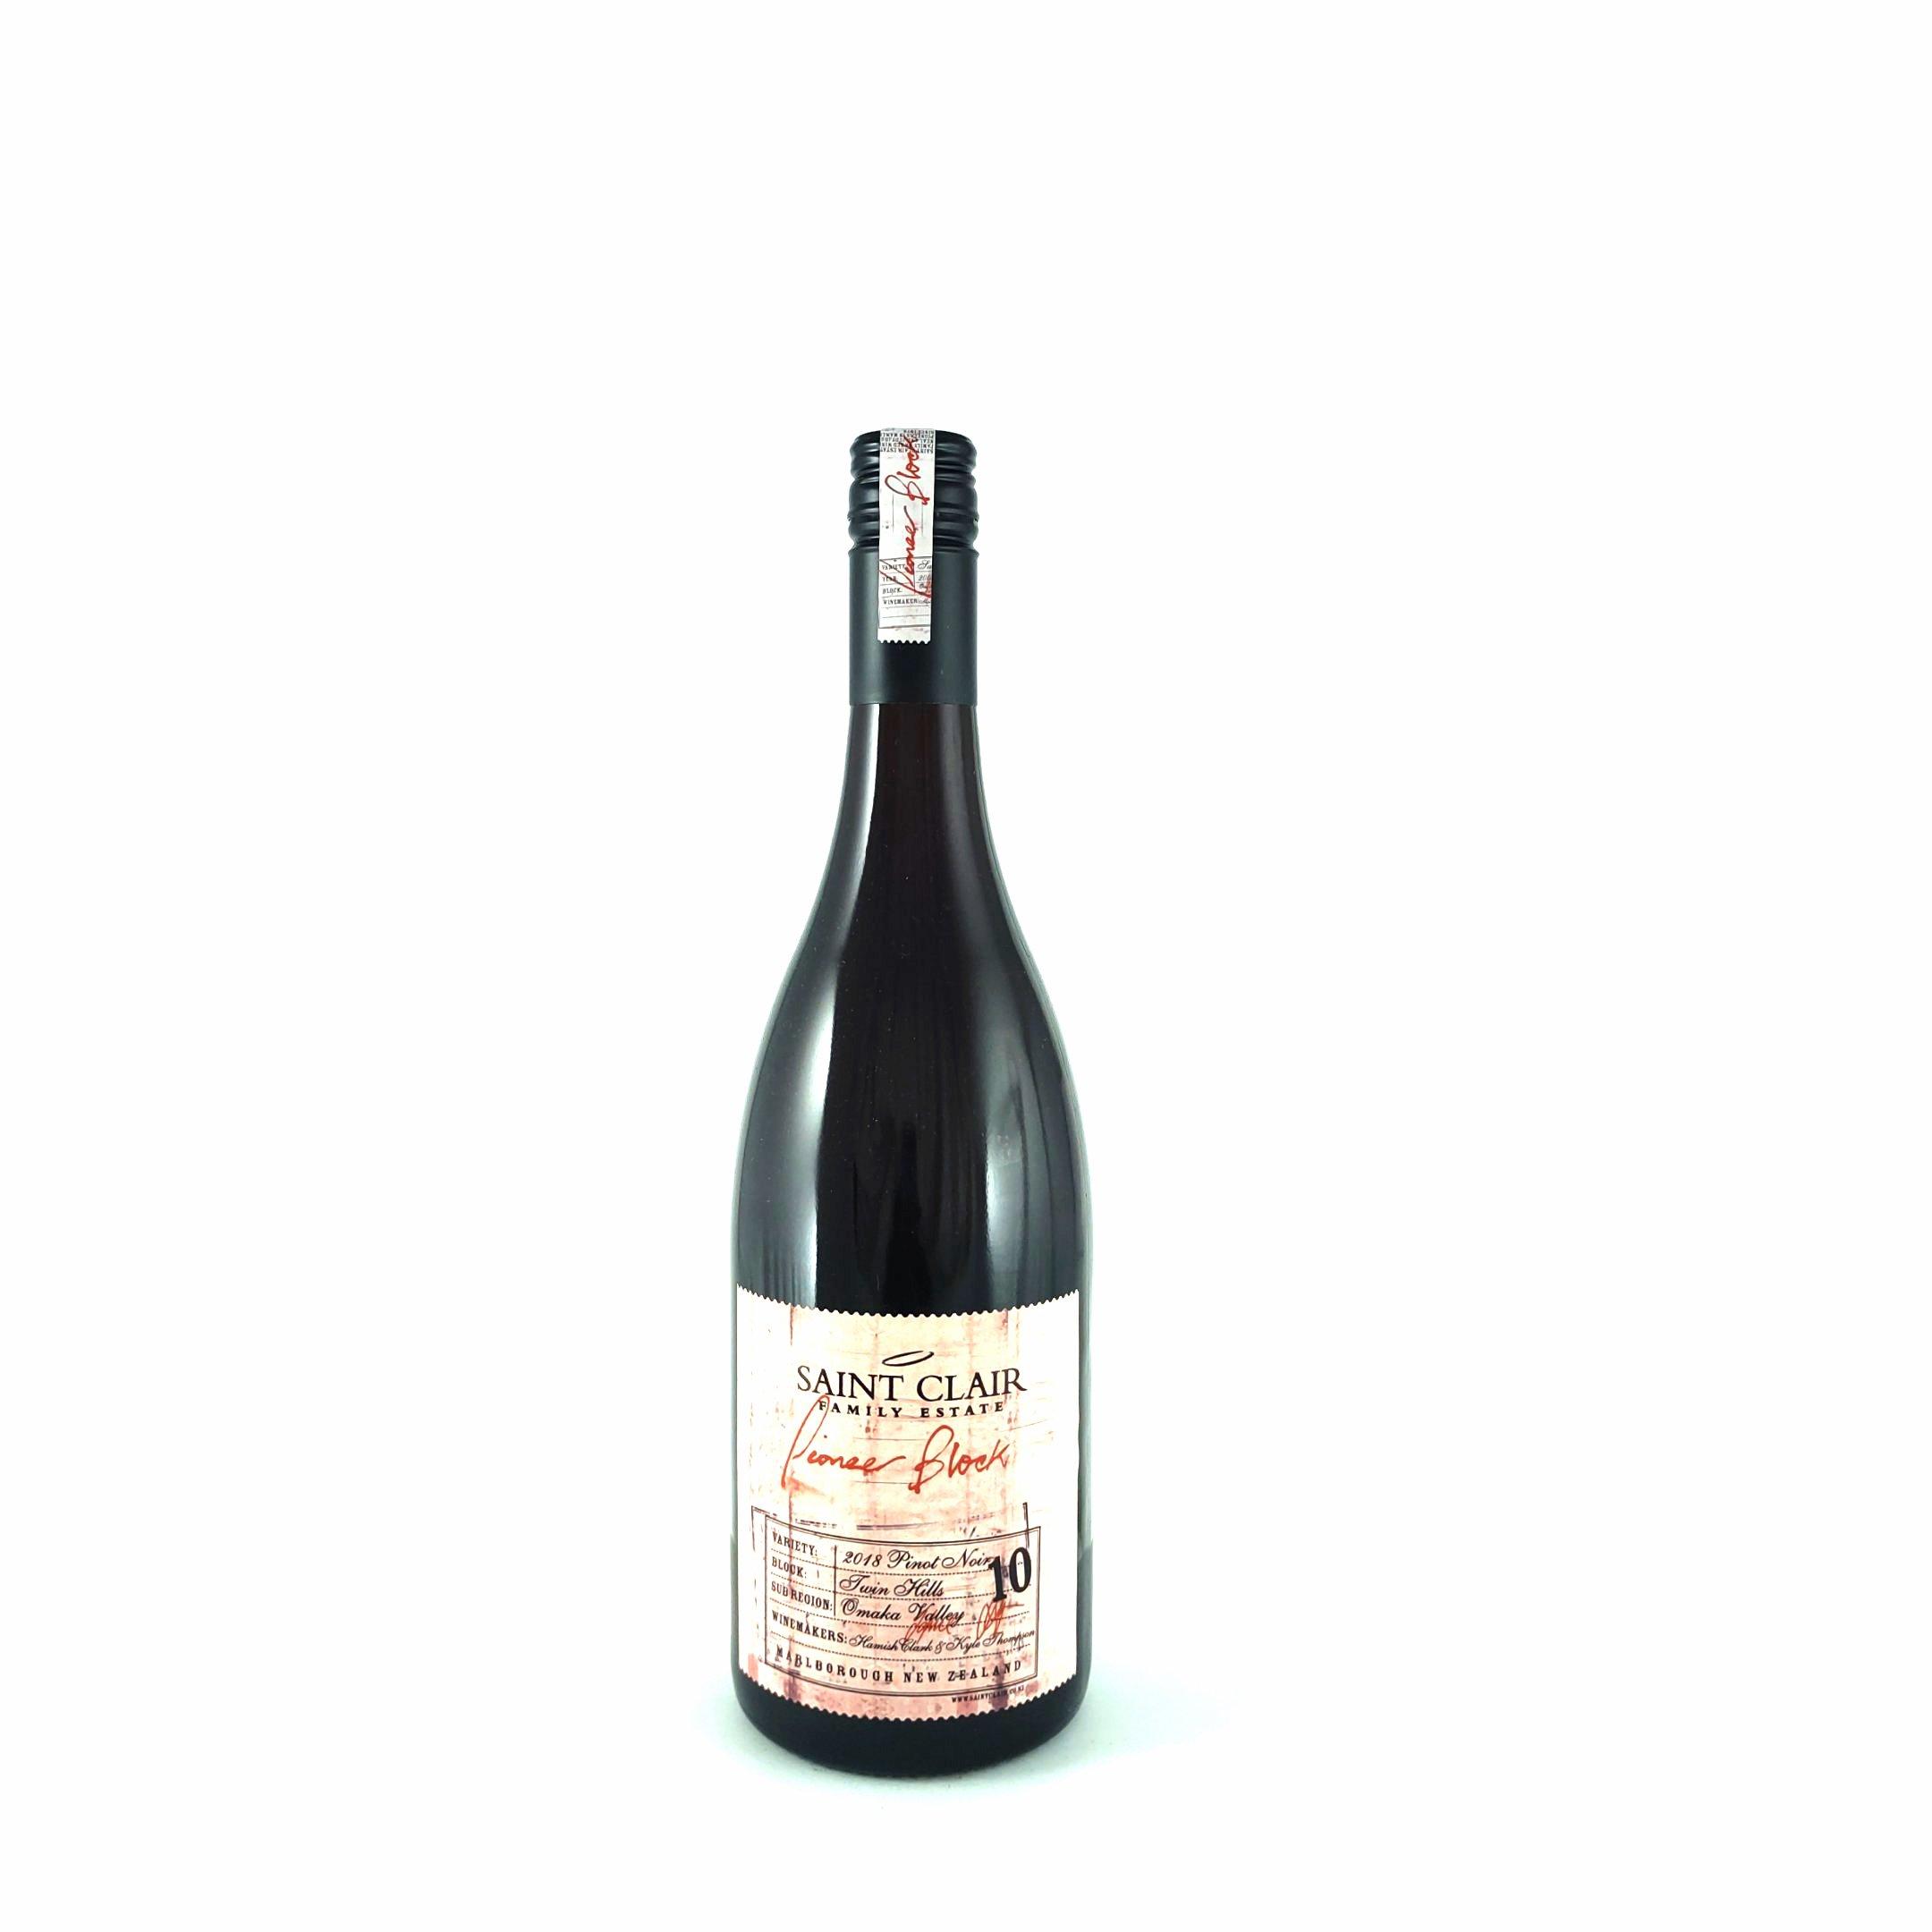 Saint Clair – Block 10 Pinot Noir 2018